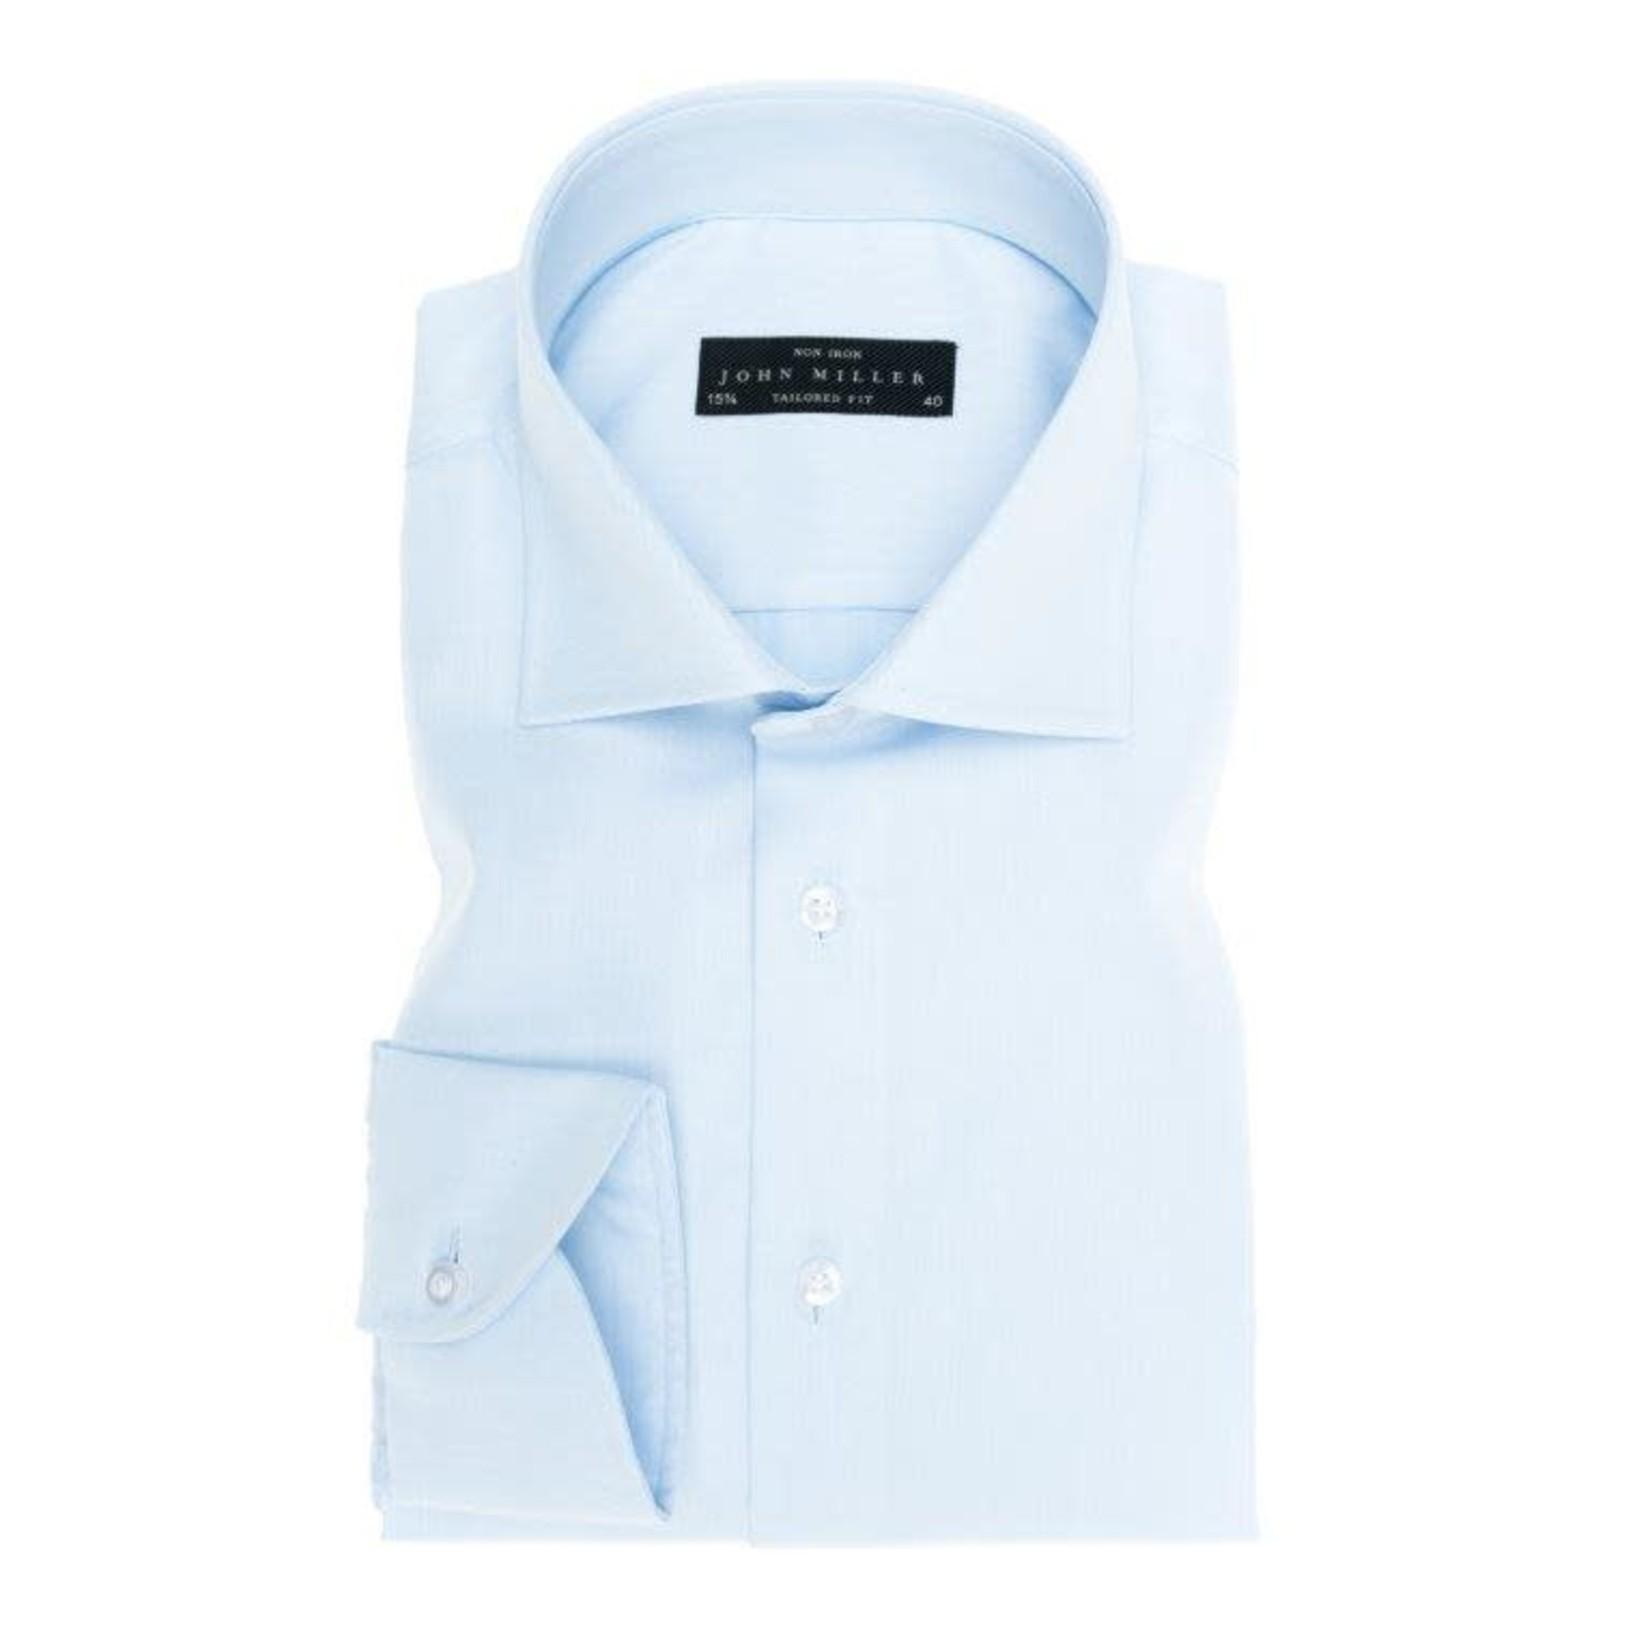 John Miller tailored fit overhemd lichtblauw met wide spread boord